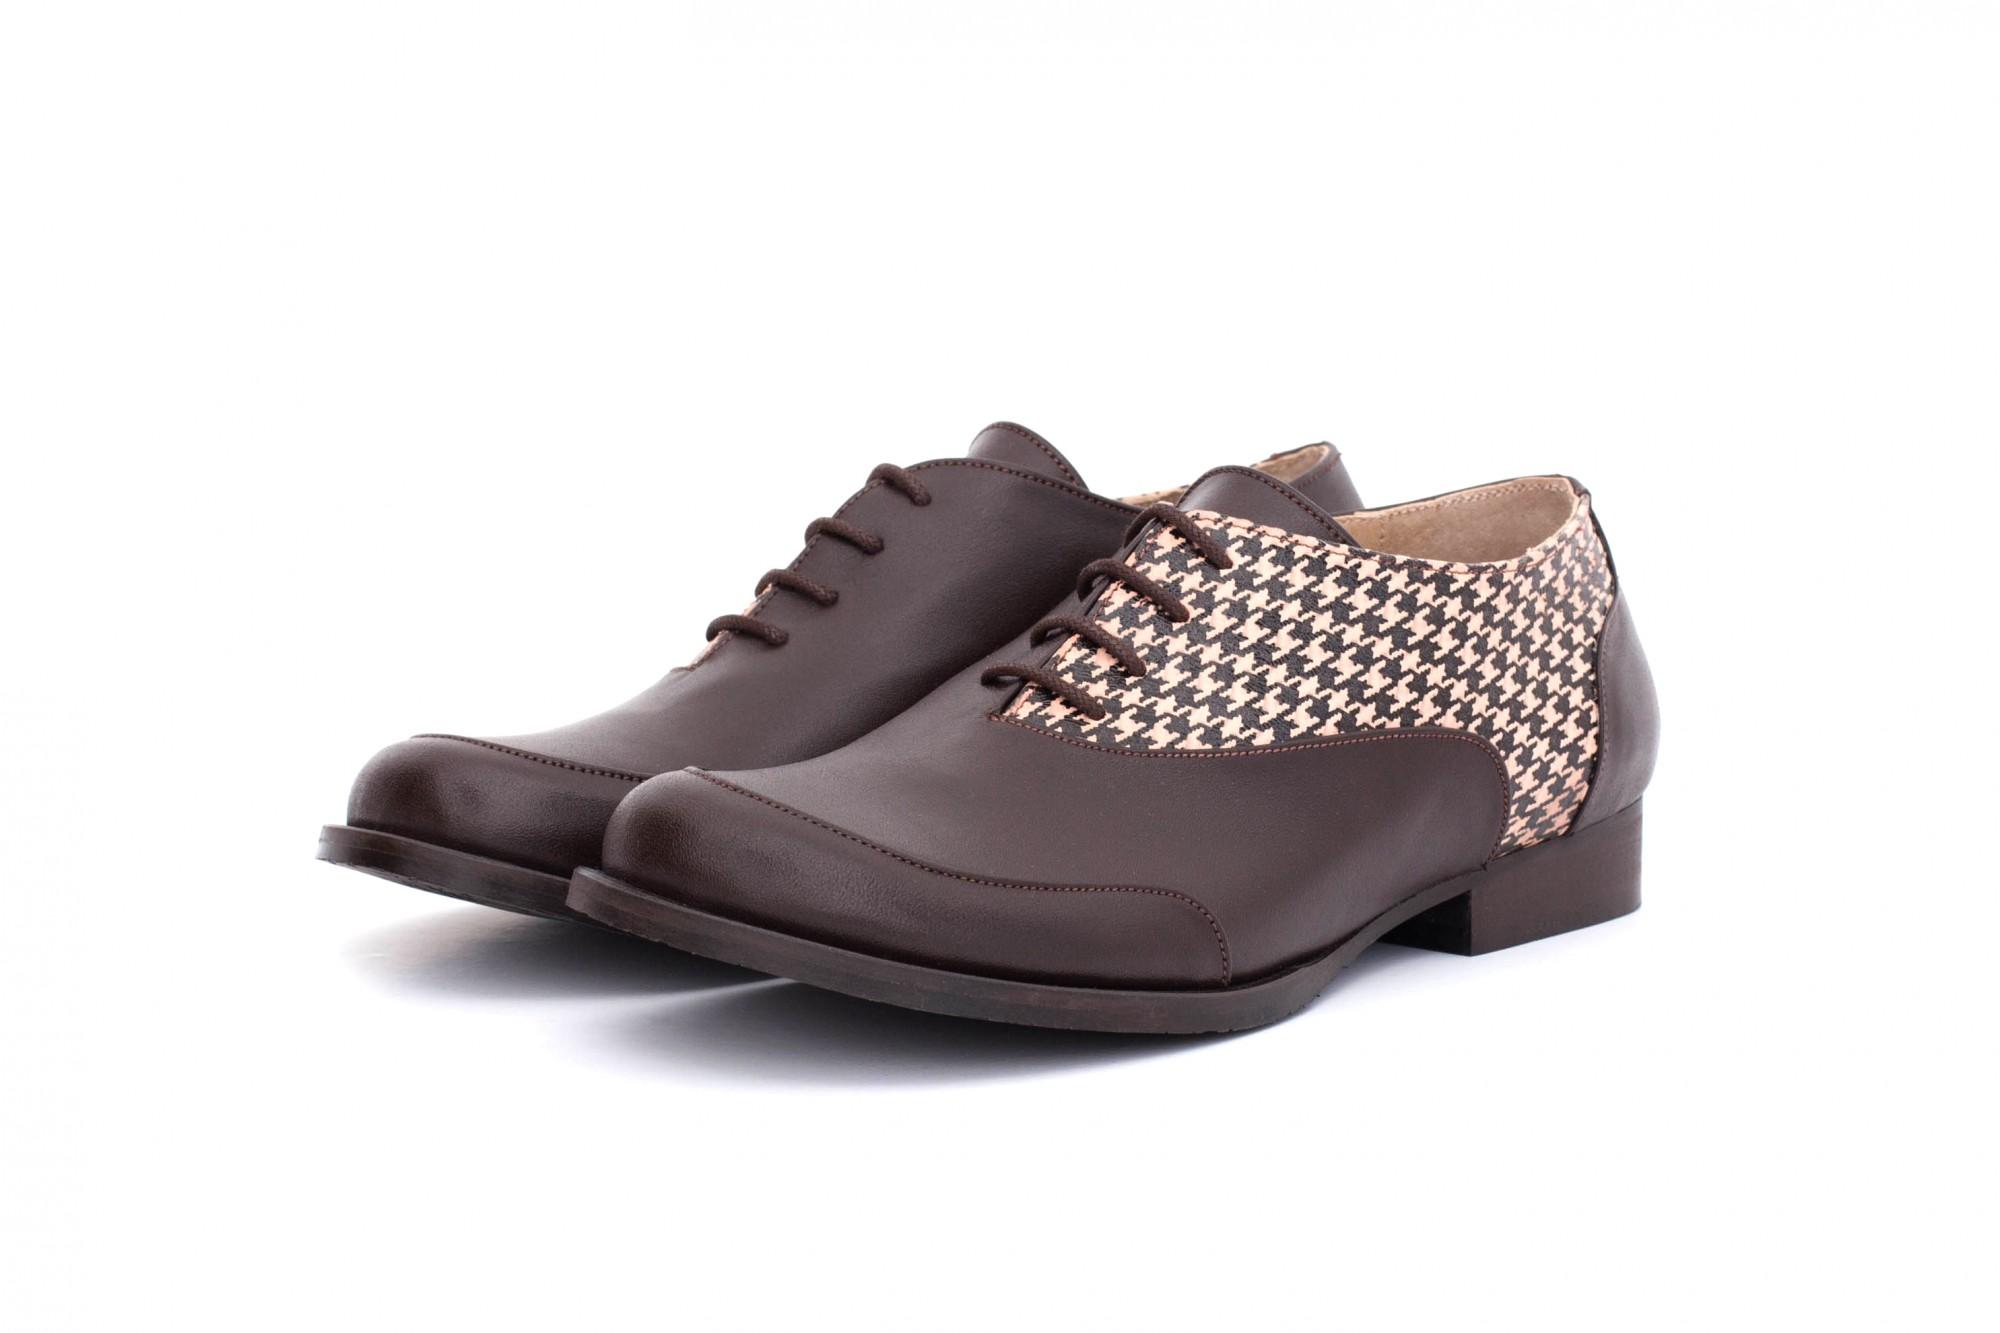 28a5b259b8 Handmade leather Shoes - Women's Leather Shoes ... - ADI KILAV